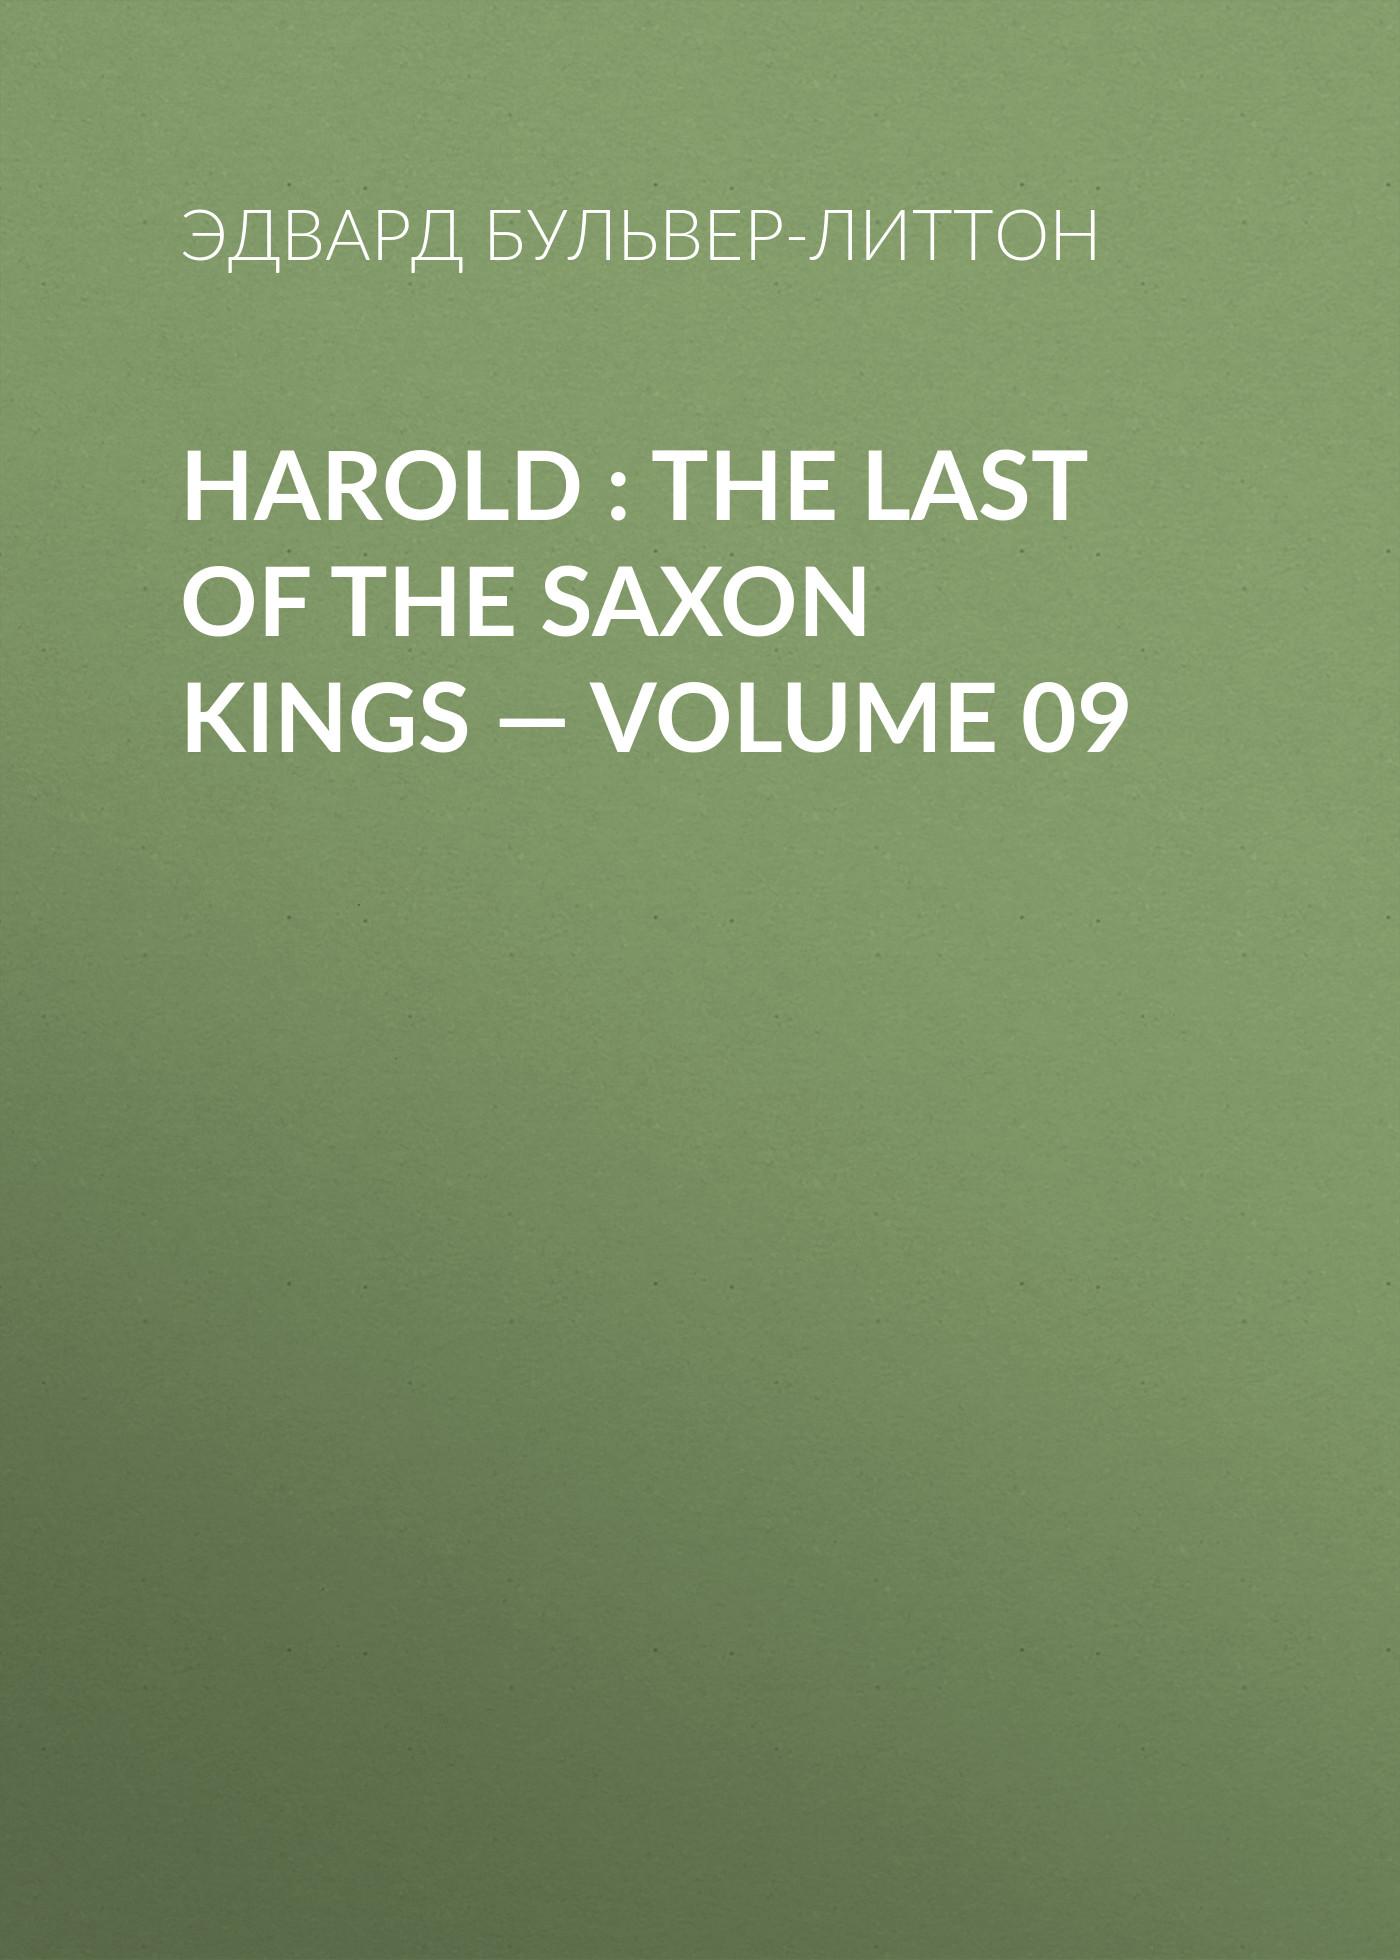 Harold : the Last of the Saxon Kings — Volume 09